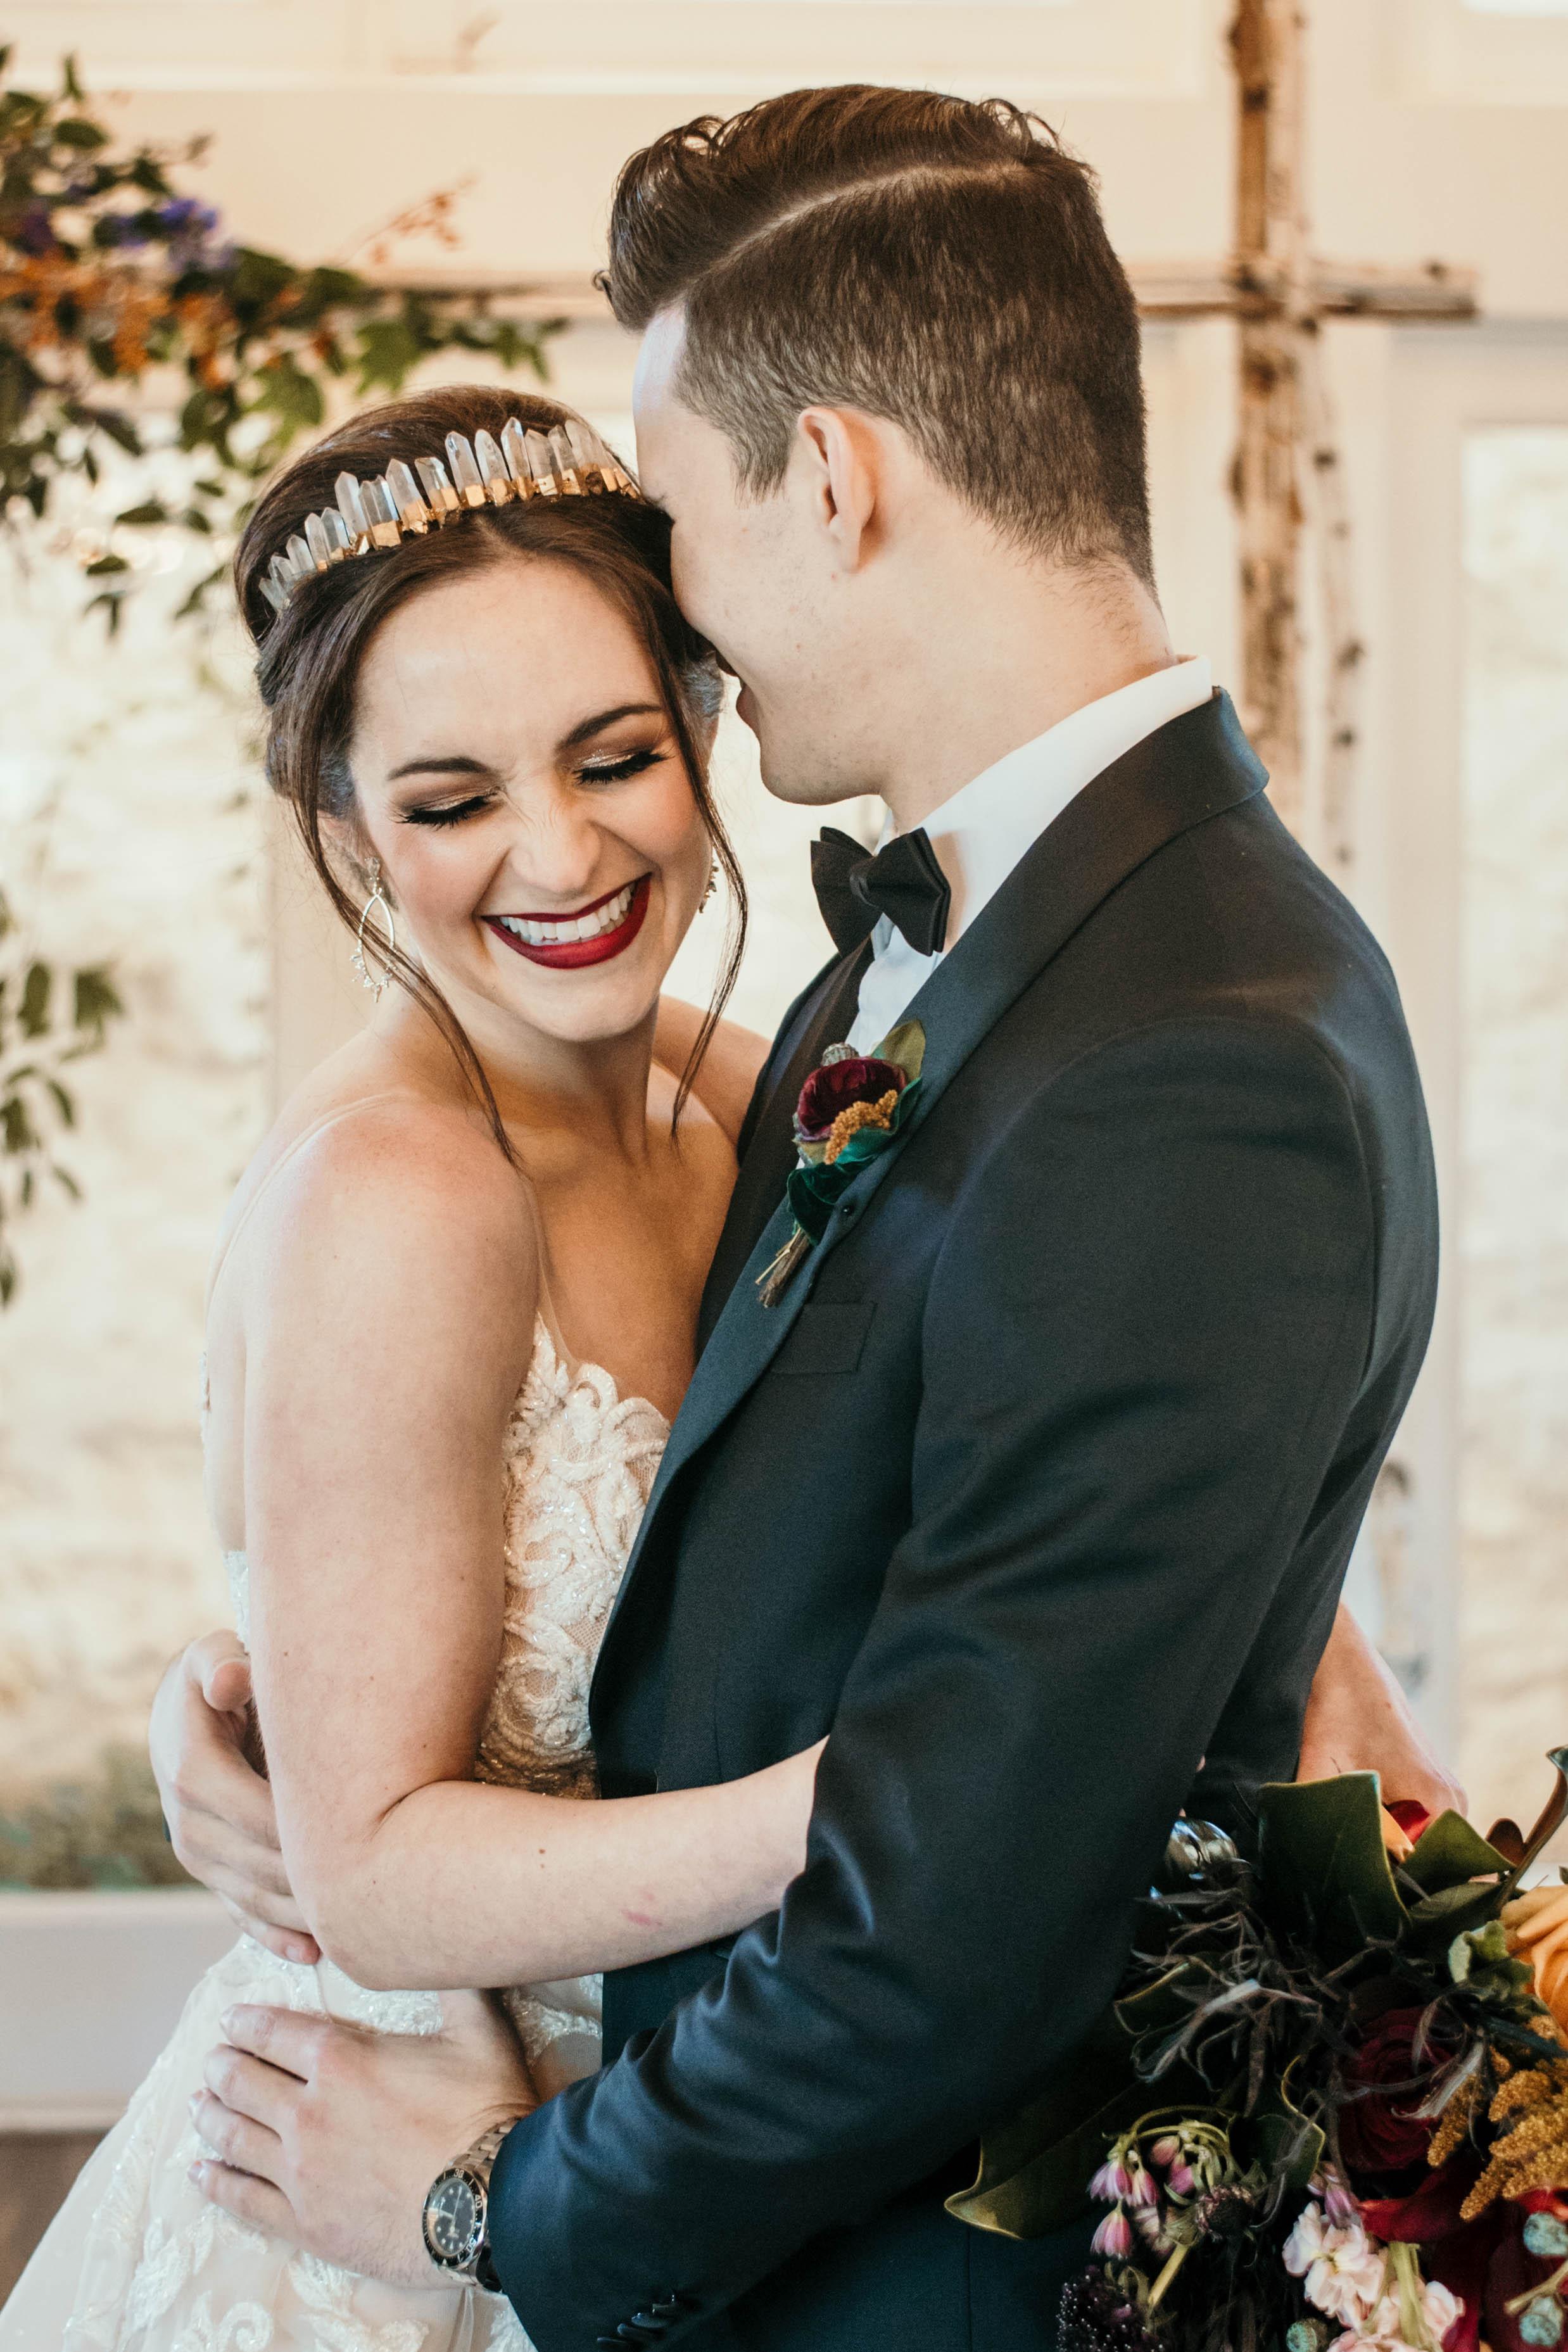 Austin Wedding Videographer - Dolls for Dolls (271 of 323).jpg